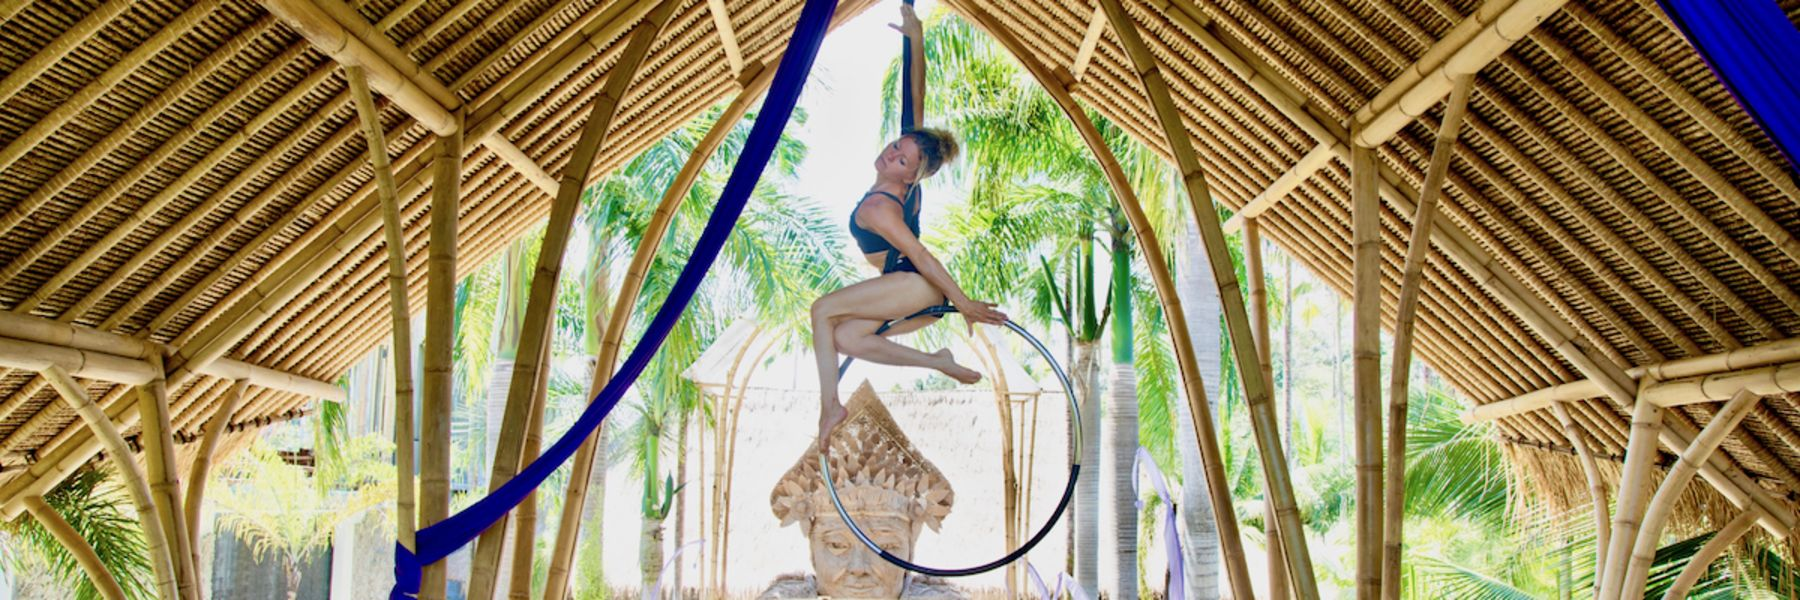 Mansion Wellness Yoga Center image